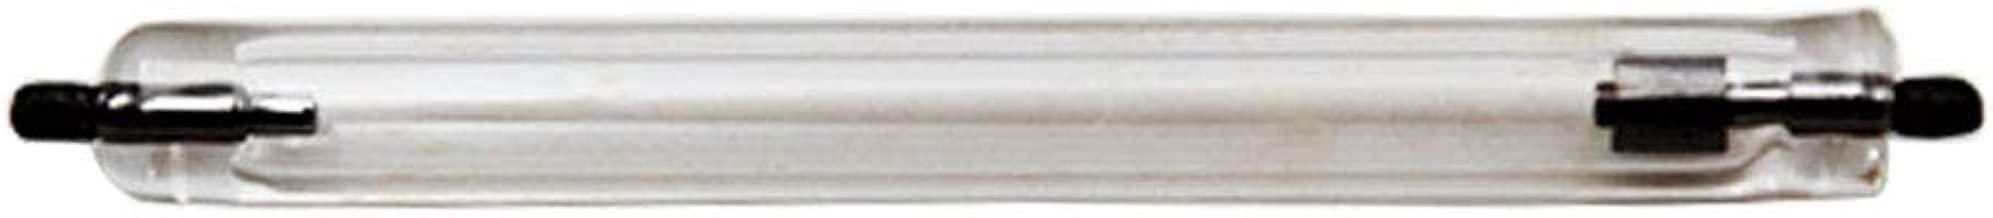 Yudesun Accessories Flash Tube Repair Part Replacement Speedlight for Fujifilm S1000 S1500 S2000 S2000HD S2500